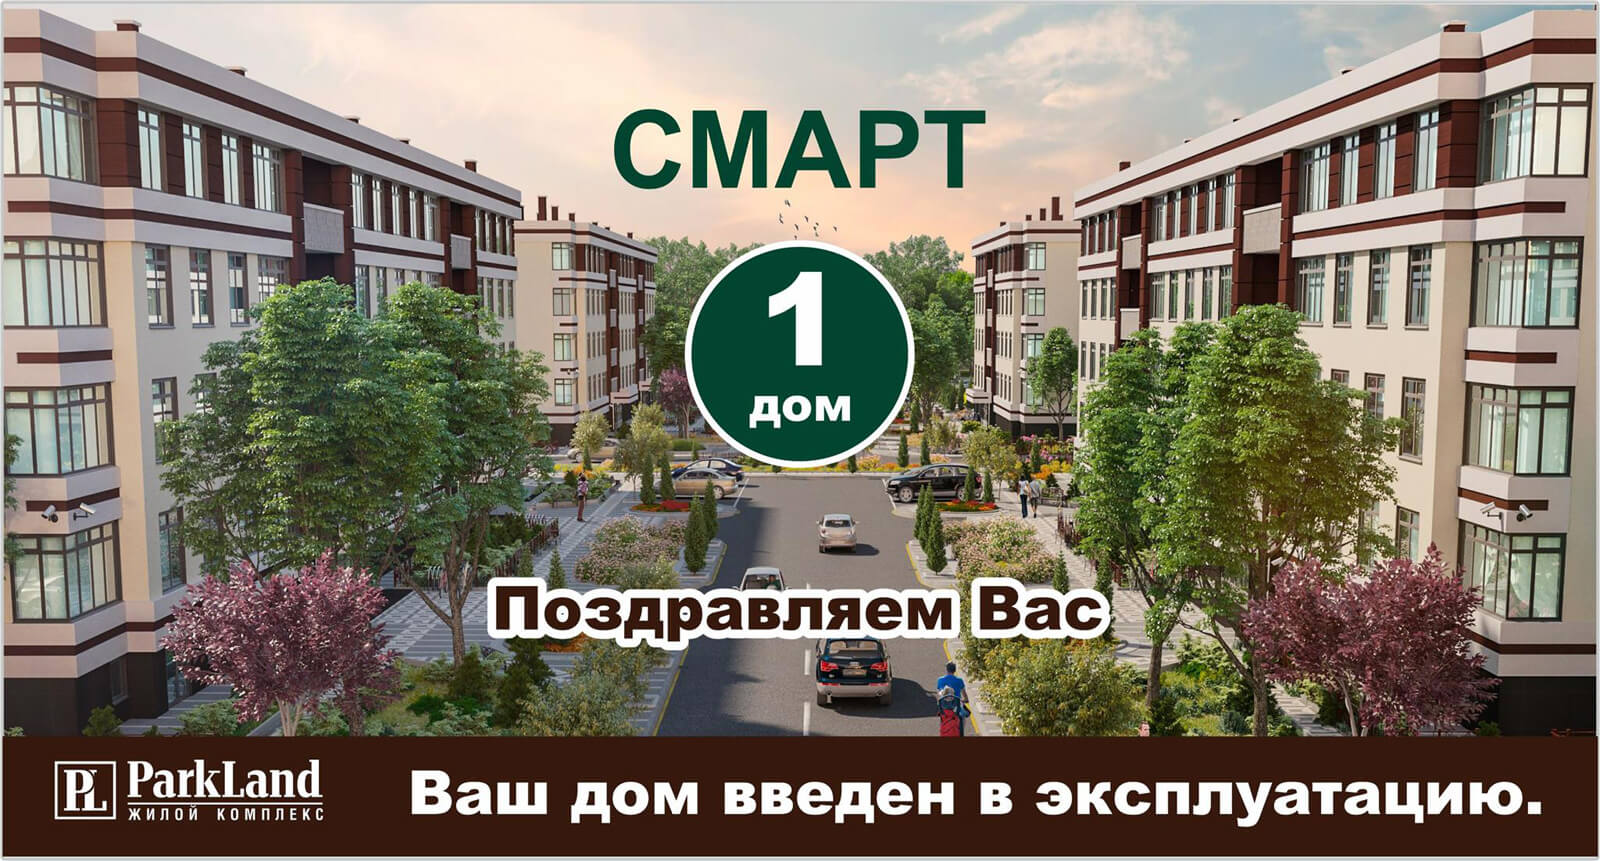 news-smart-1110618-ru